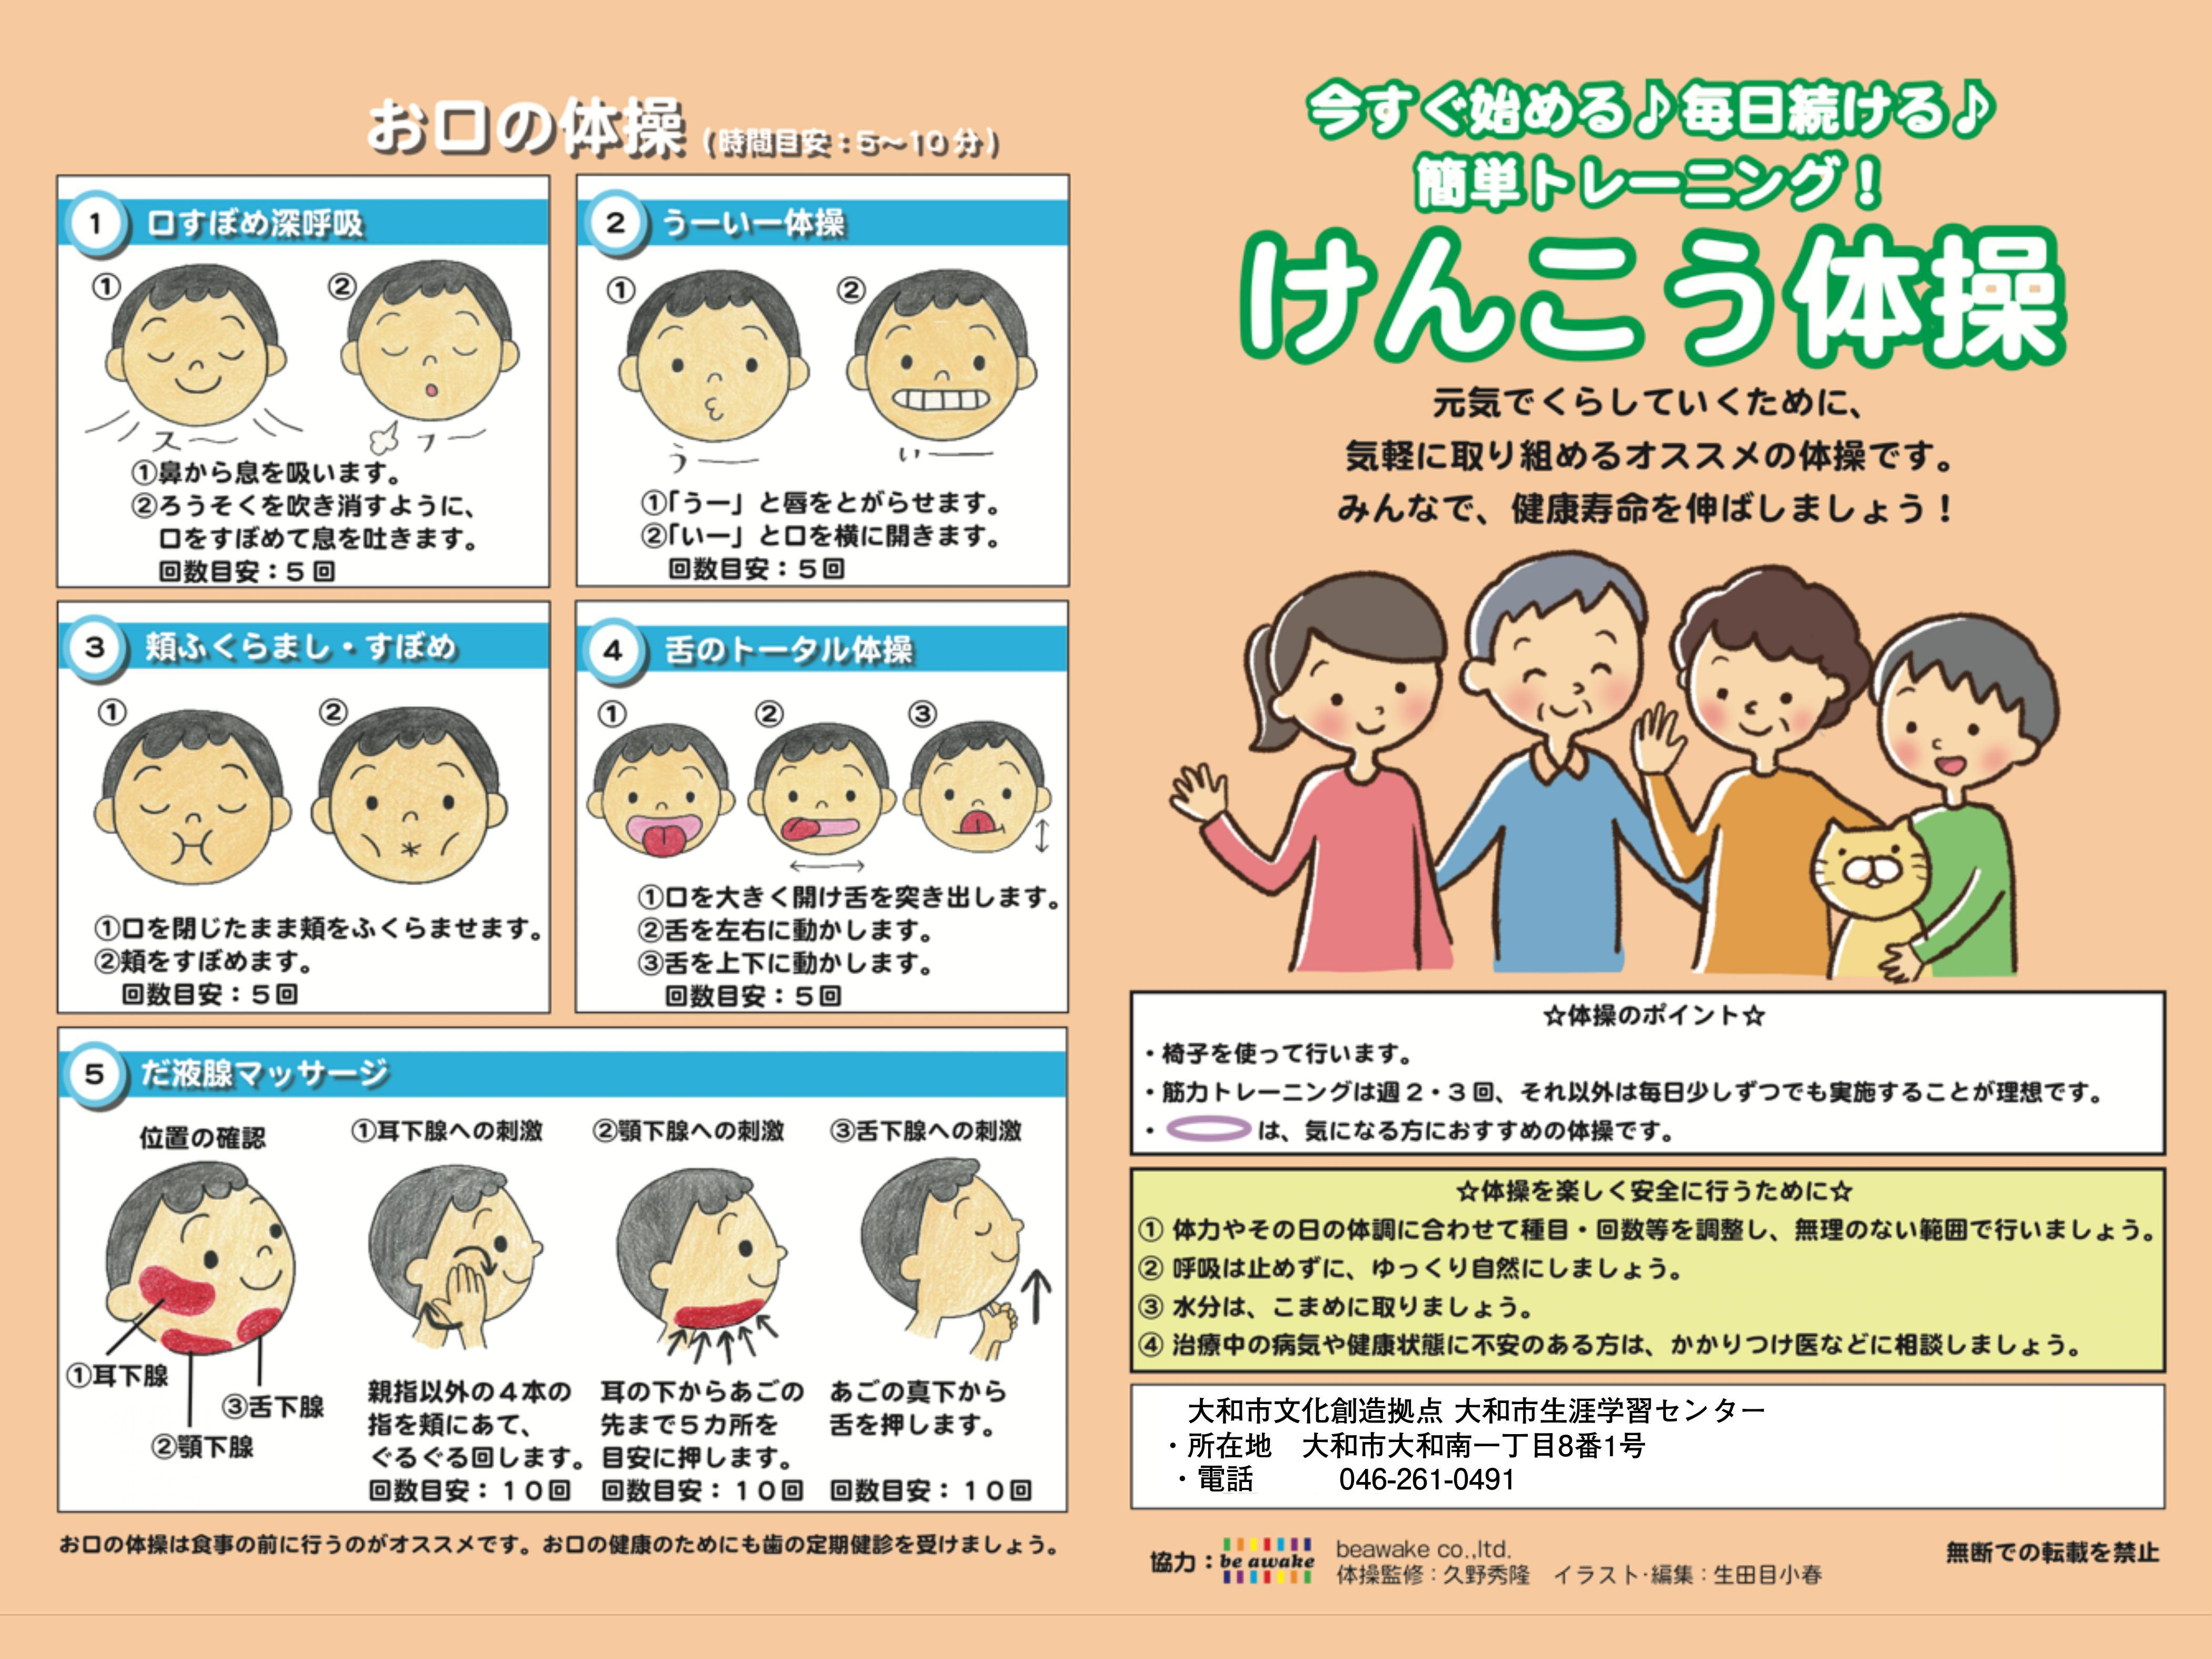 https://yamato-bunka.jp/learning/files/e4b9032eed3a38f651155859362d67d82ea56194.jpg